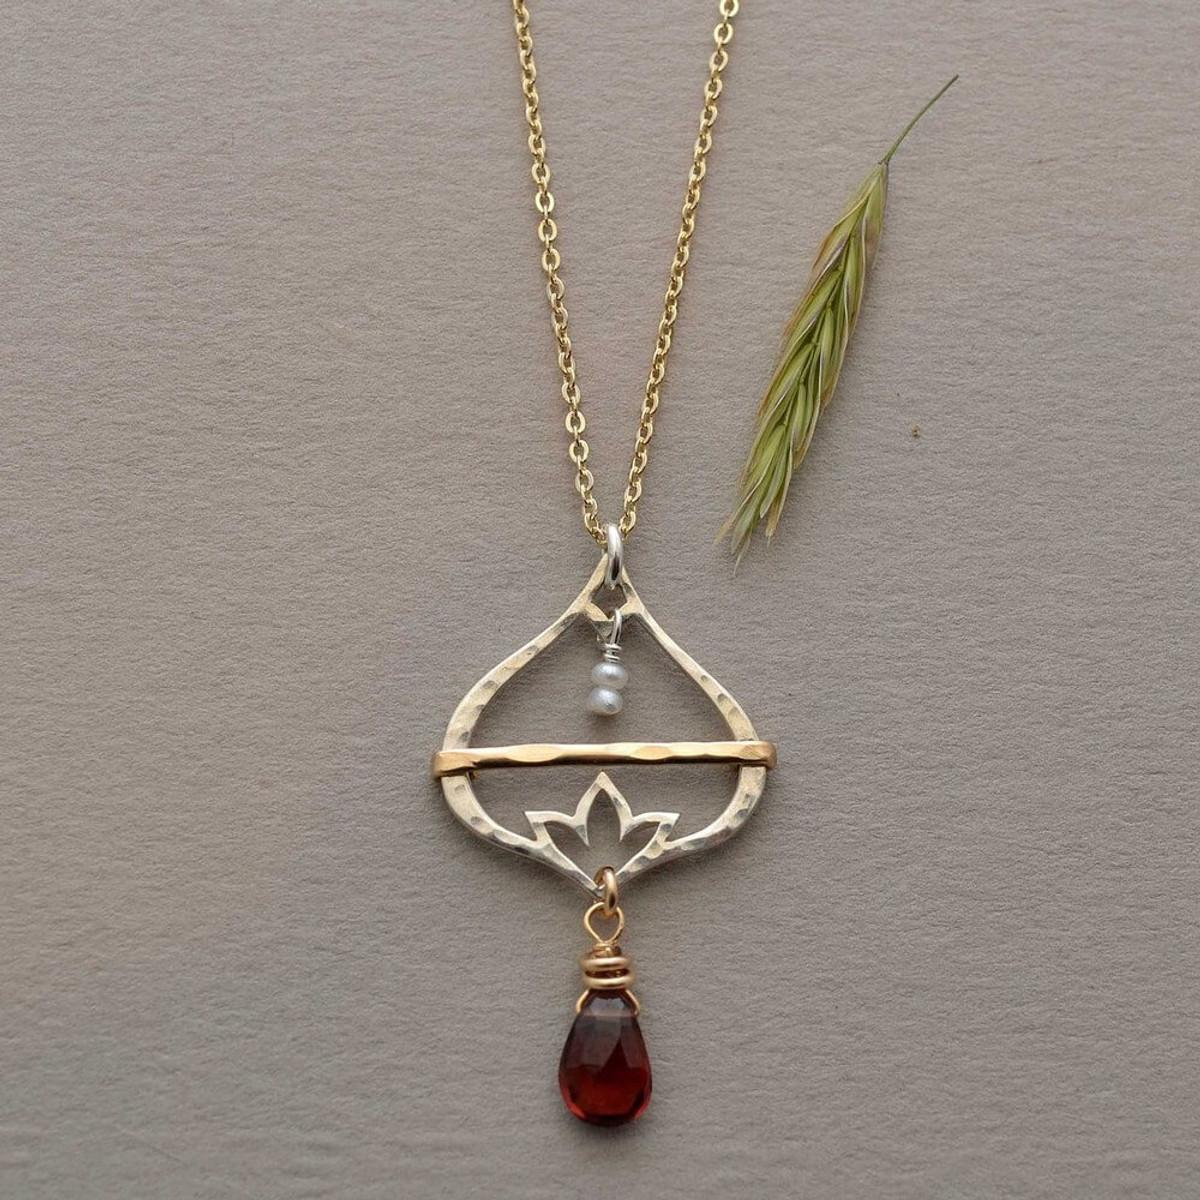 Handmade lotus flower necklace plumb line jewelry sterling silver lotus flower necklace view 1 izmirmasajfo